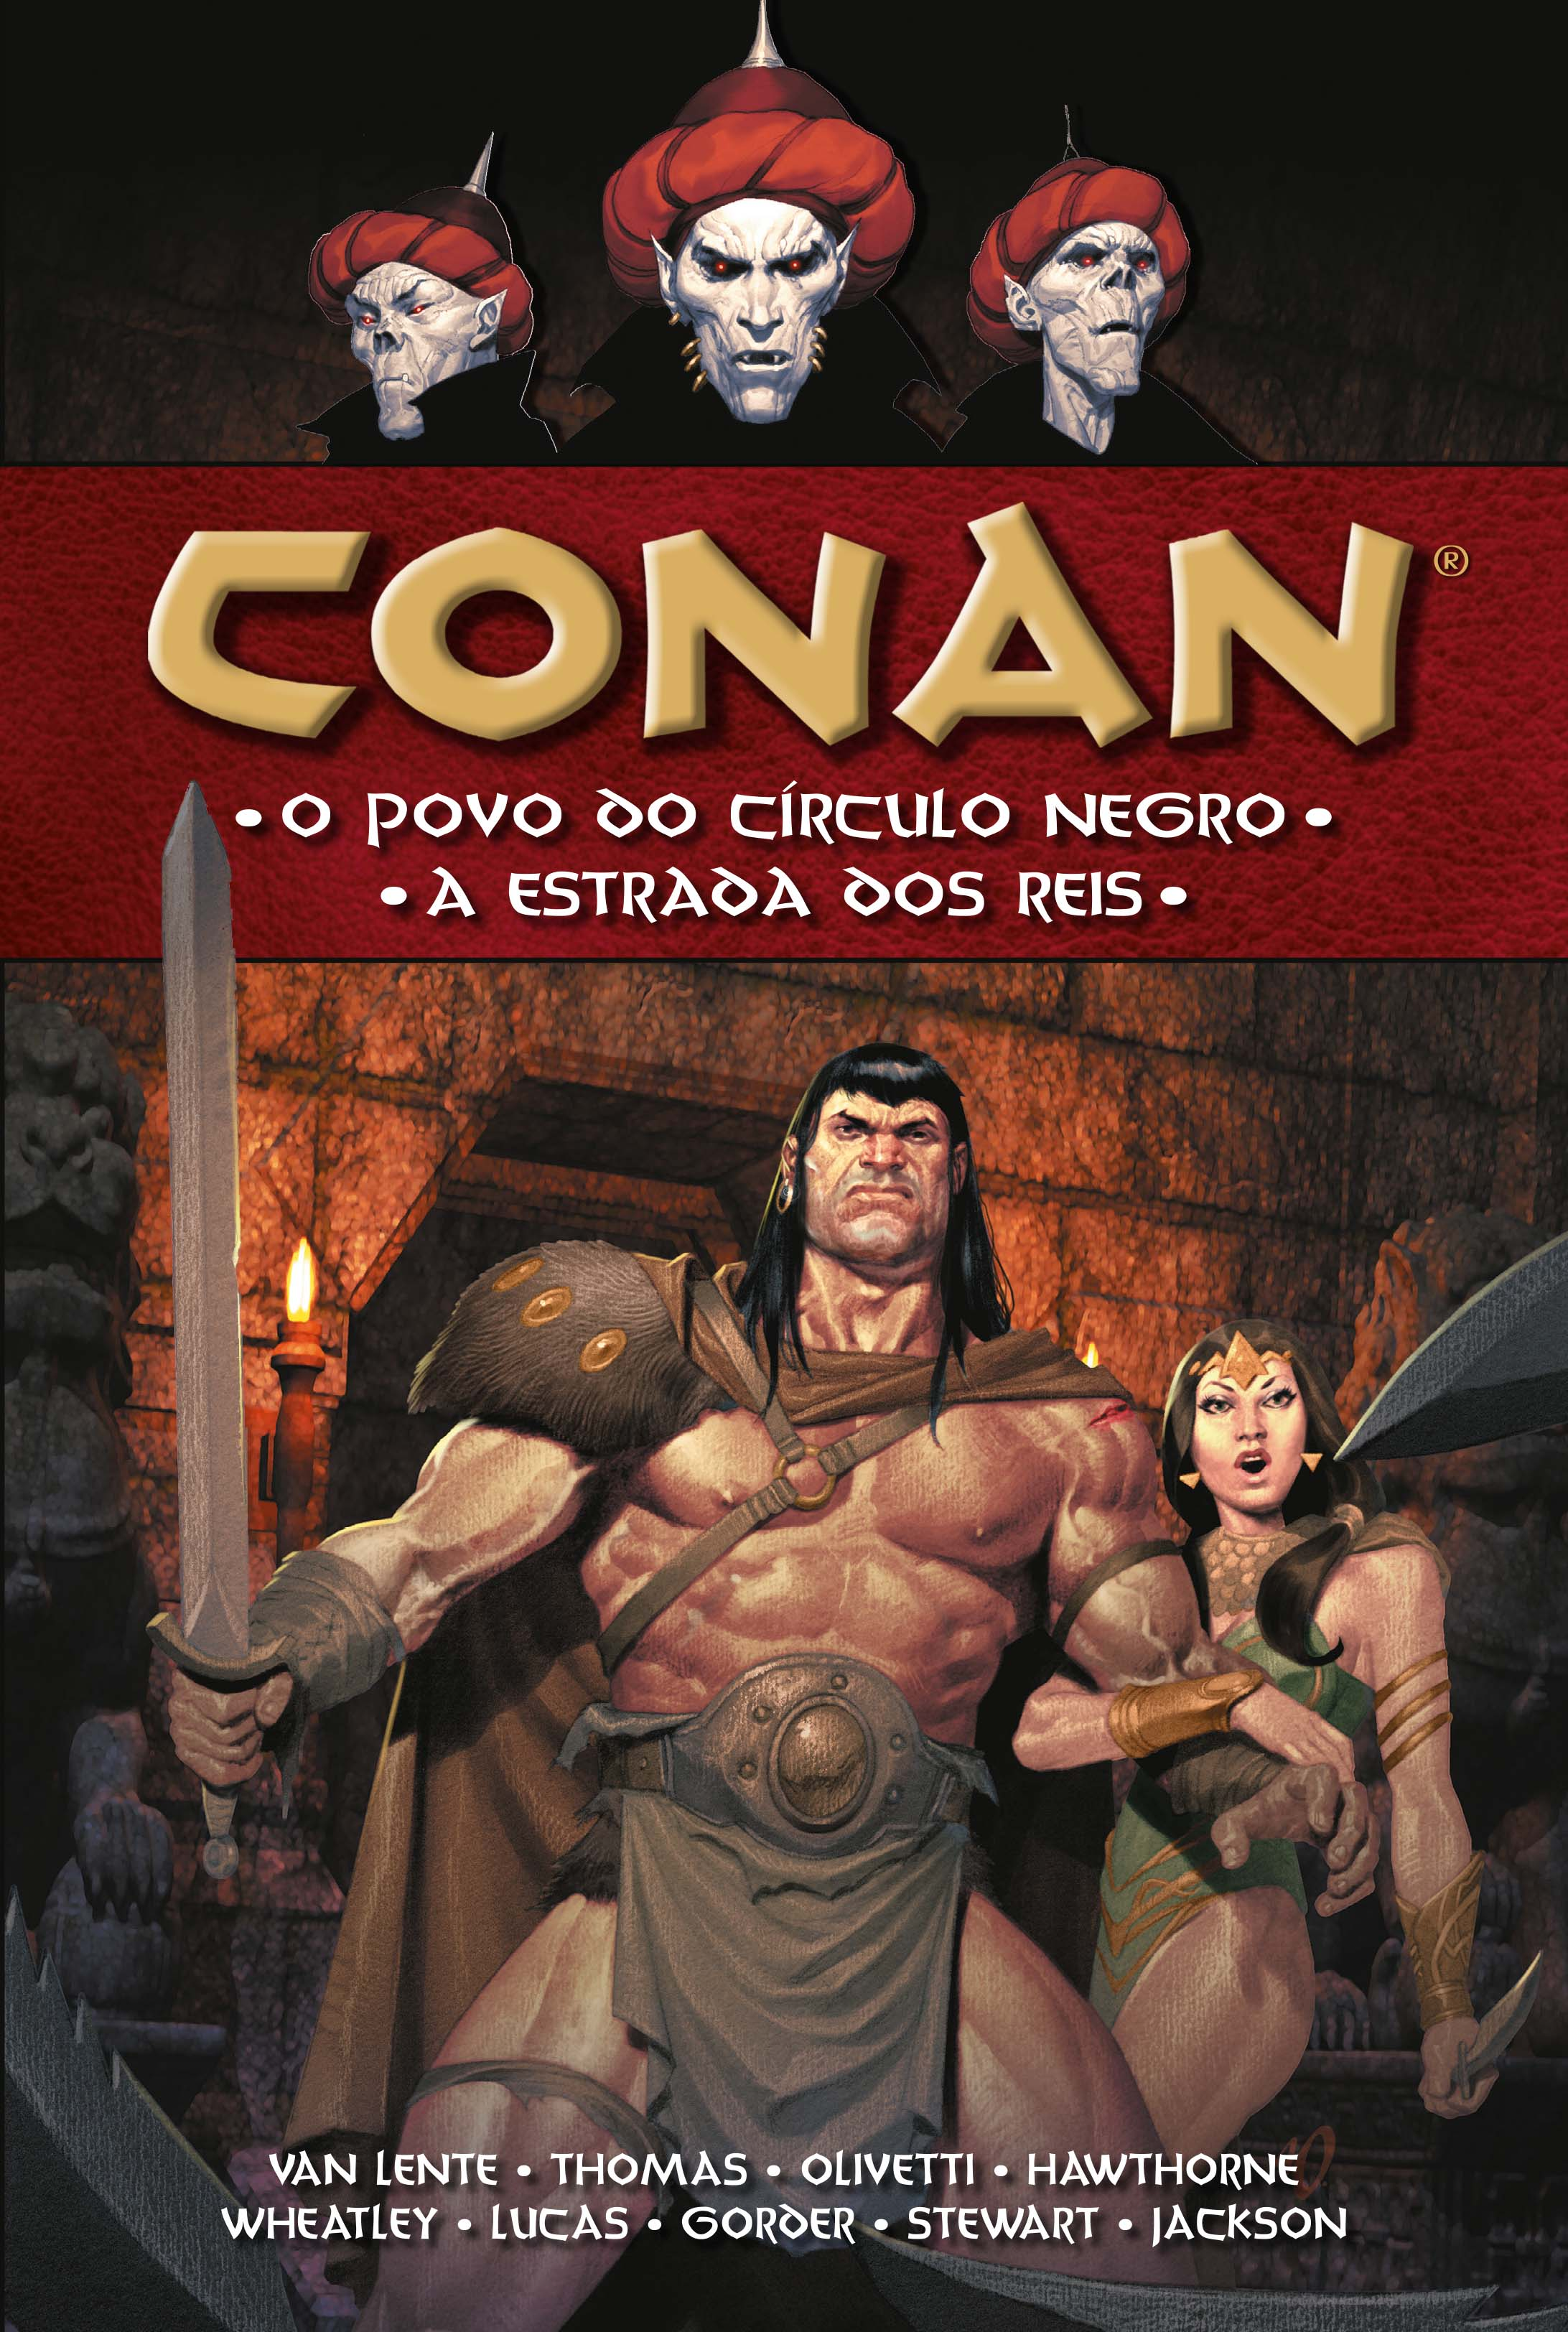 CONAN VOL. 11 - O POVO DO CÍRCULO NEGRO / A ESTRADA DOS REIS